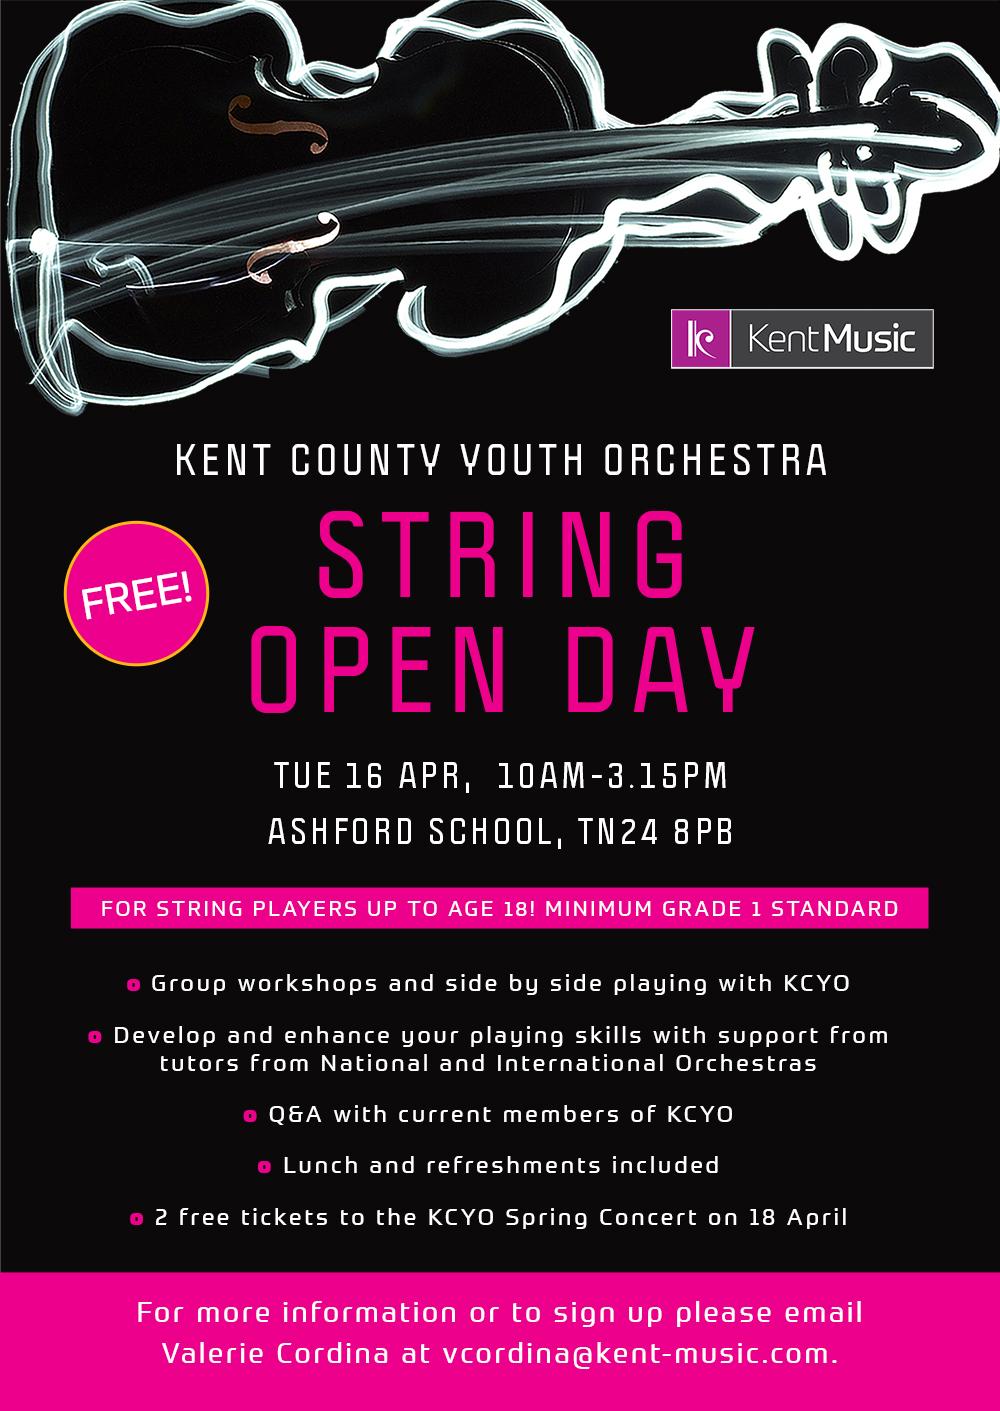 KCYO String Open Day - February 2019 | Kent Music